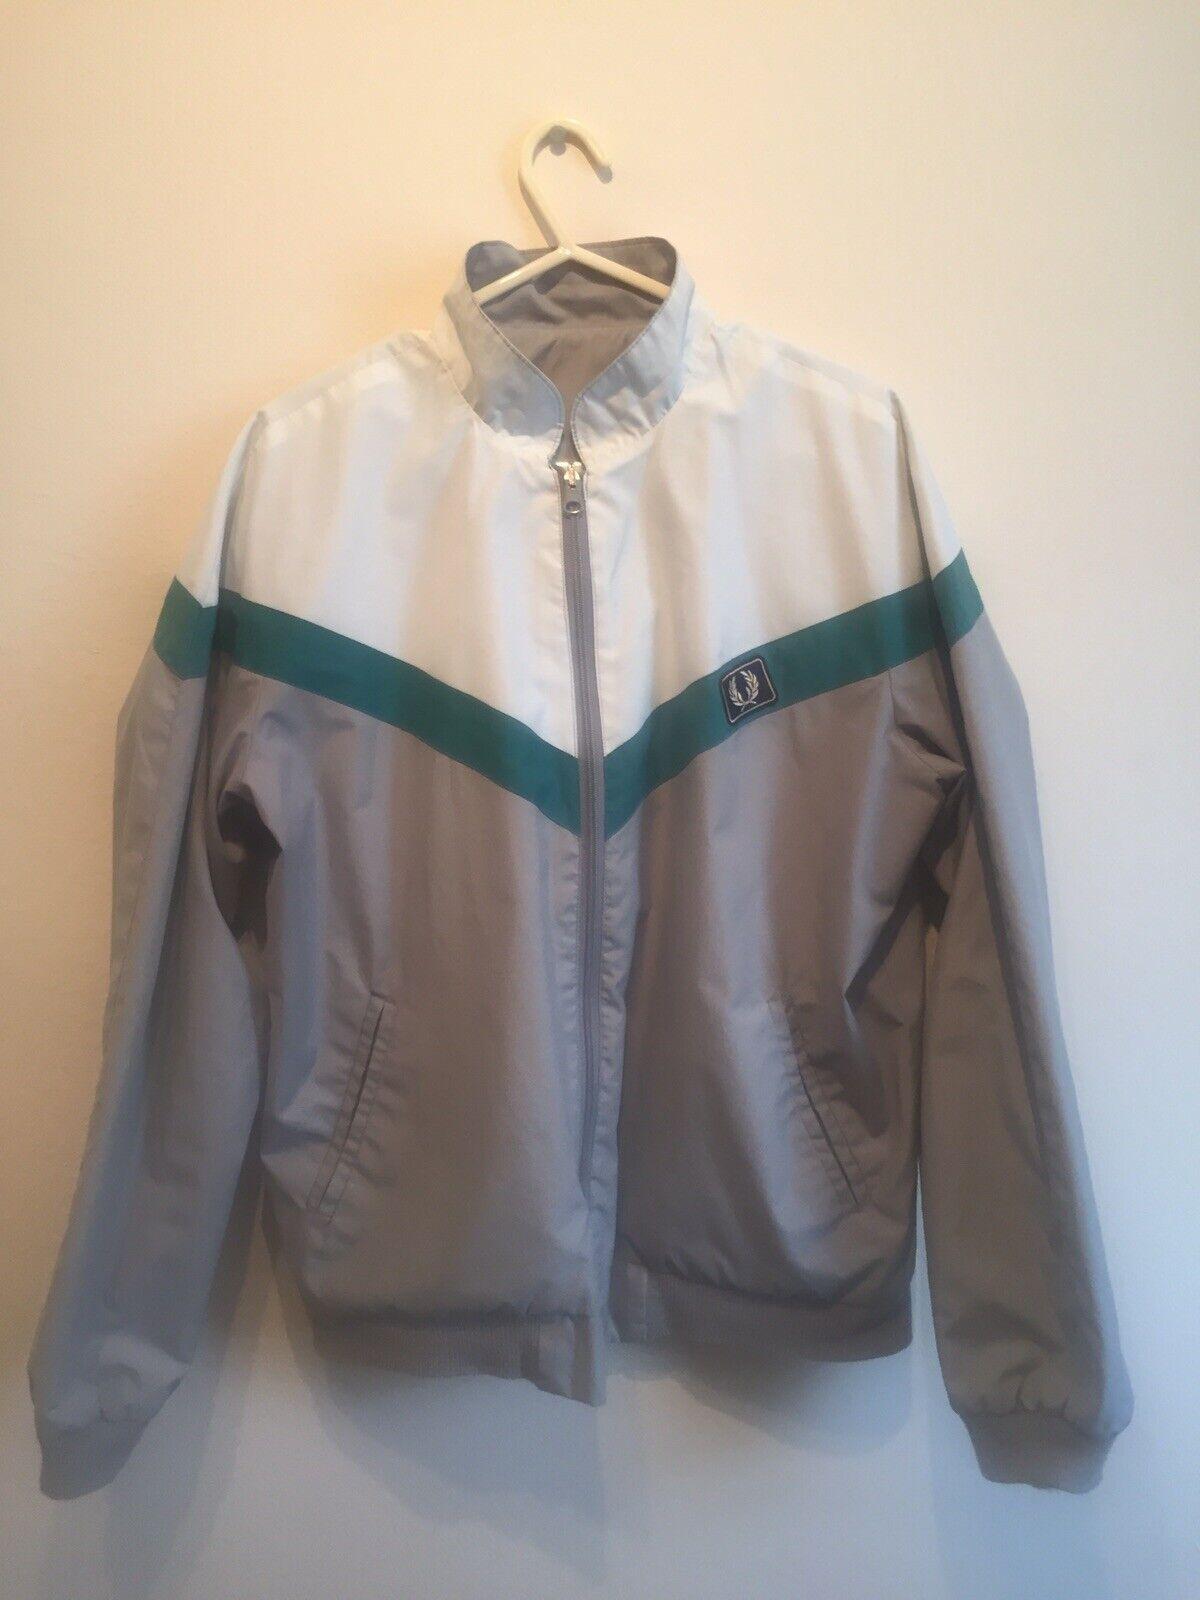 Frot PERRY Größe M-L männer's Rare Vintage 70's 80's Reversible Bomber jacke Coat